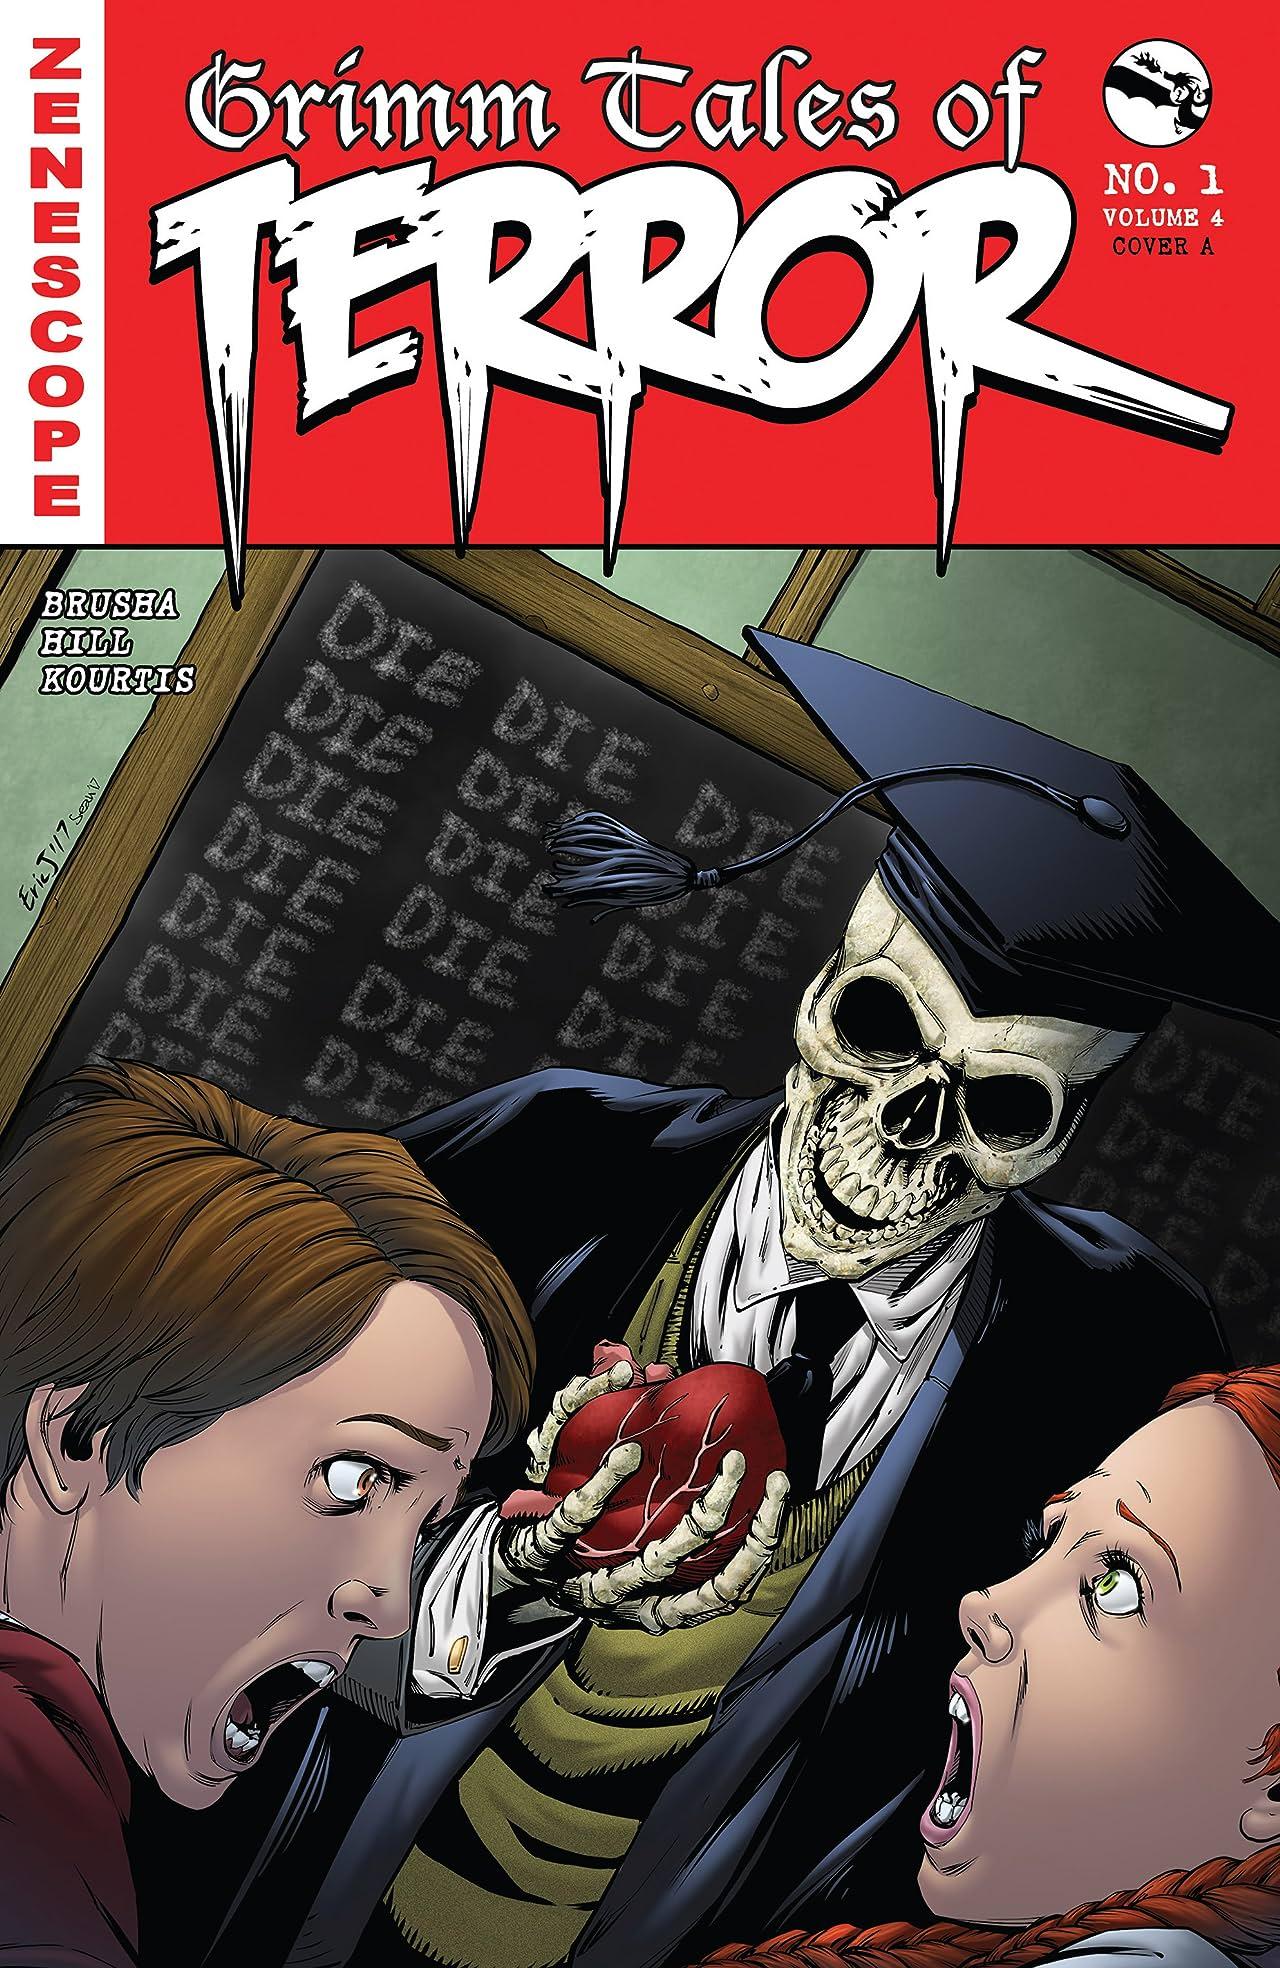 Grimm Tales of Terror Vol. 4 #1